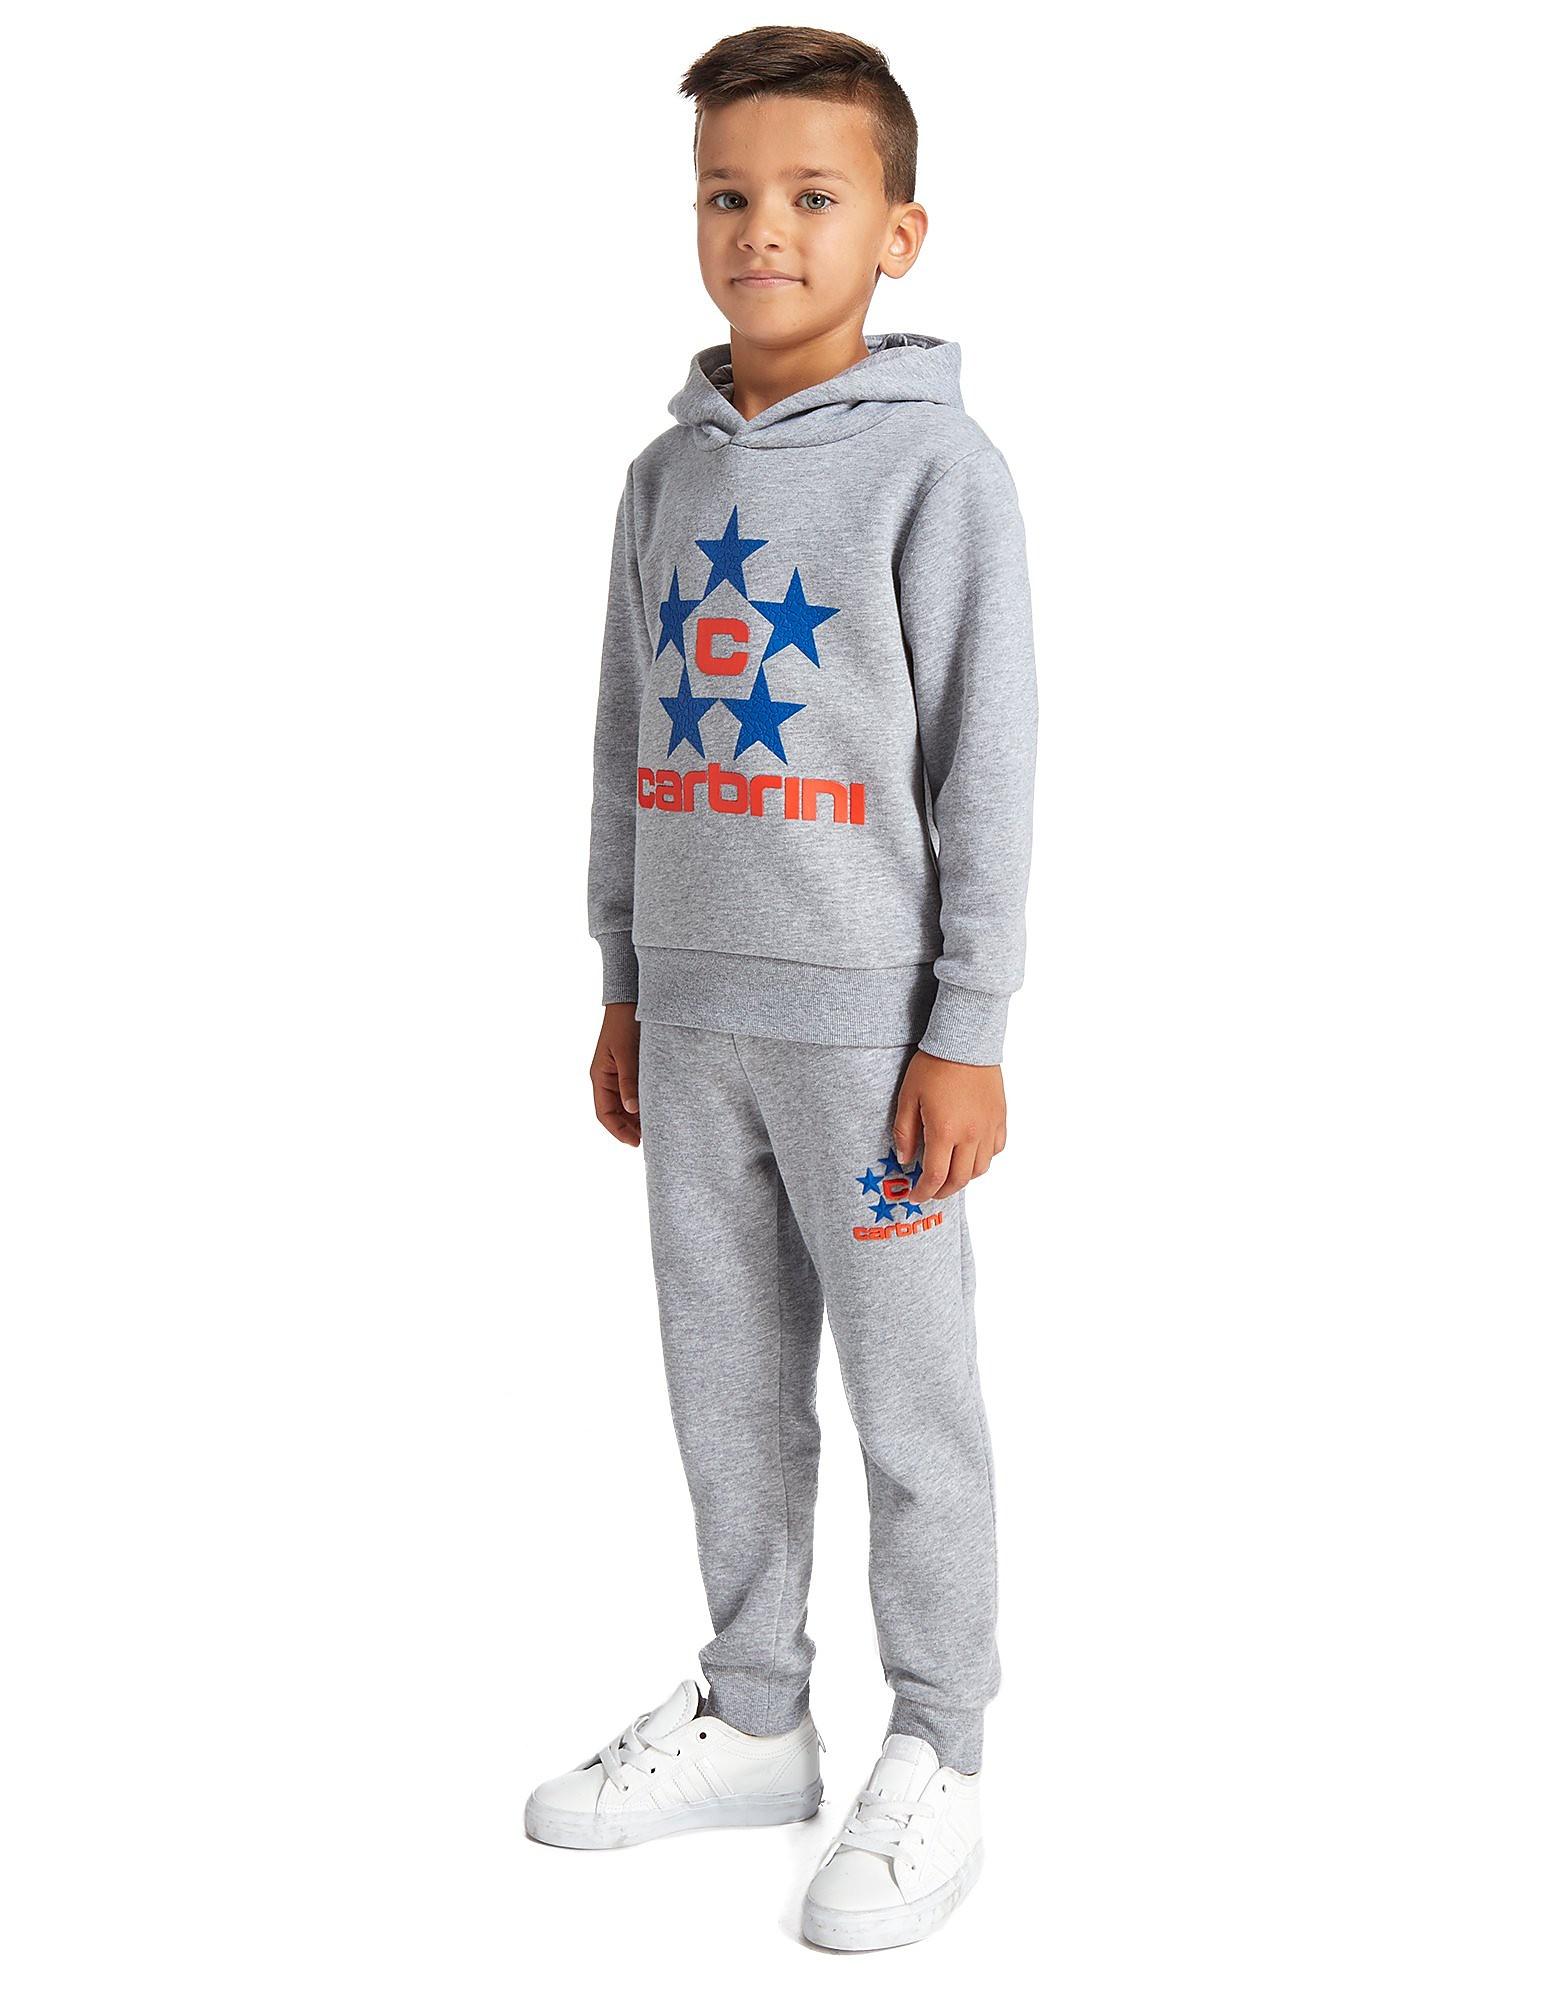 Carbrini Rocket Suit Children